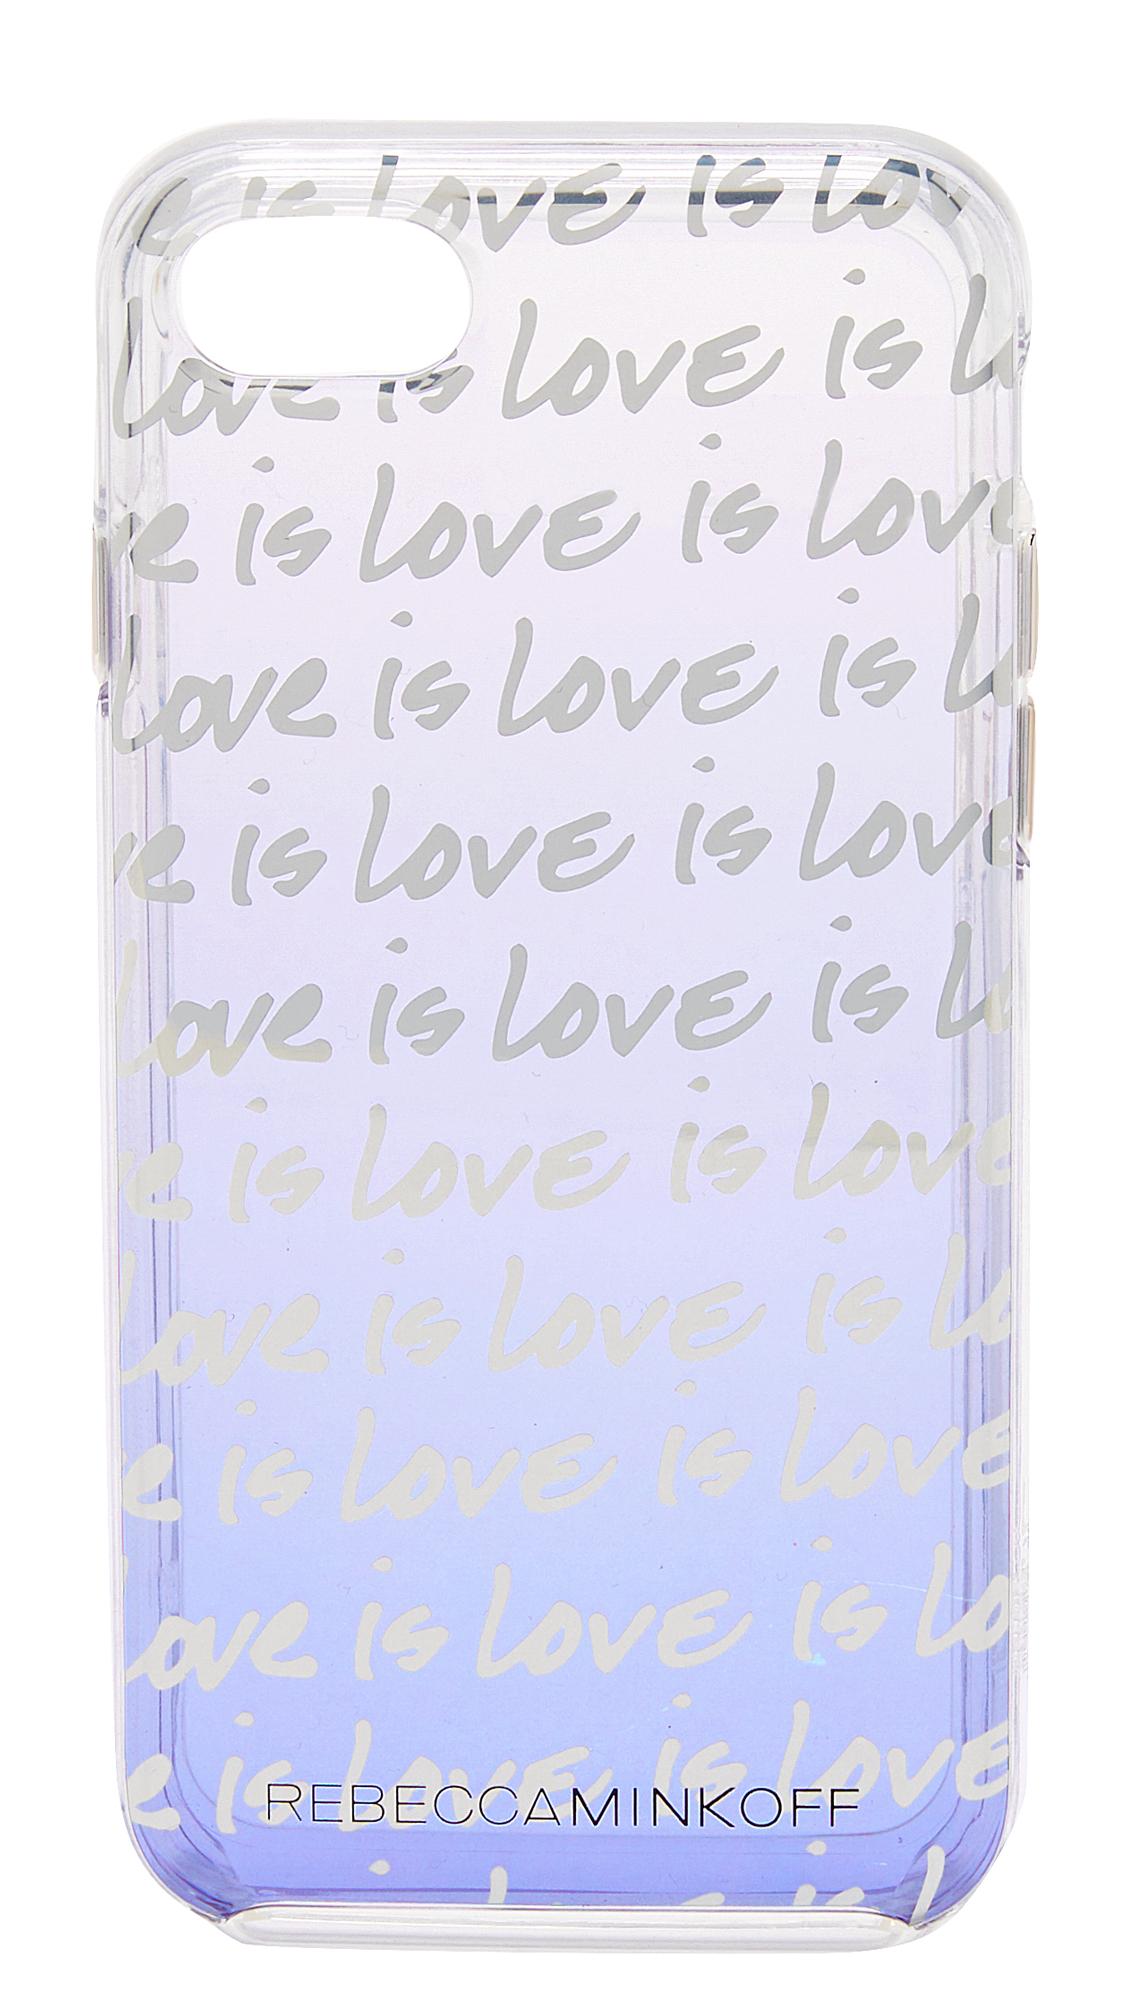 Rebecca Minkoff Love is Love iPhone 7 Case - White